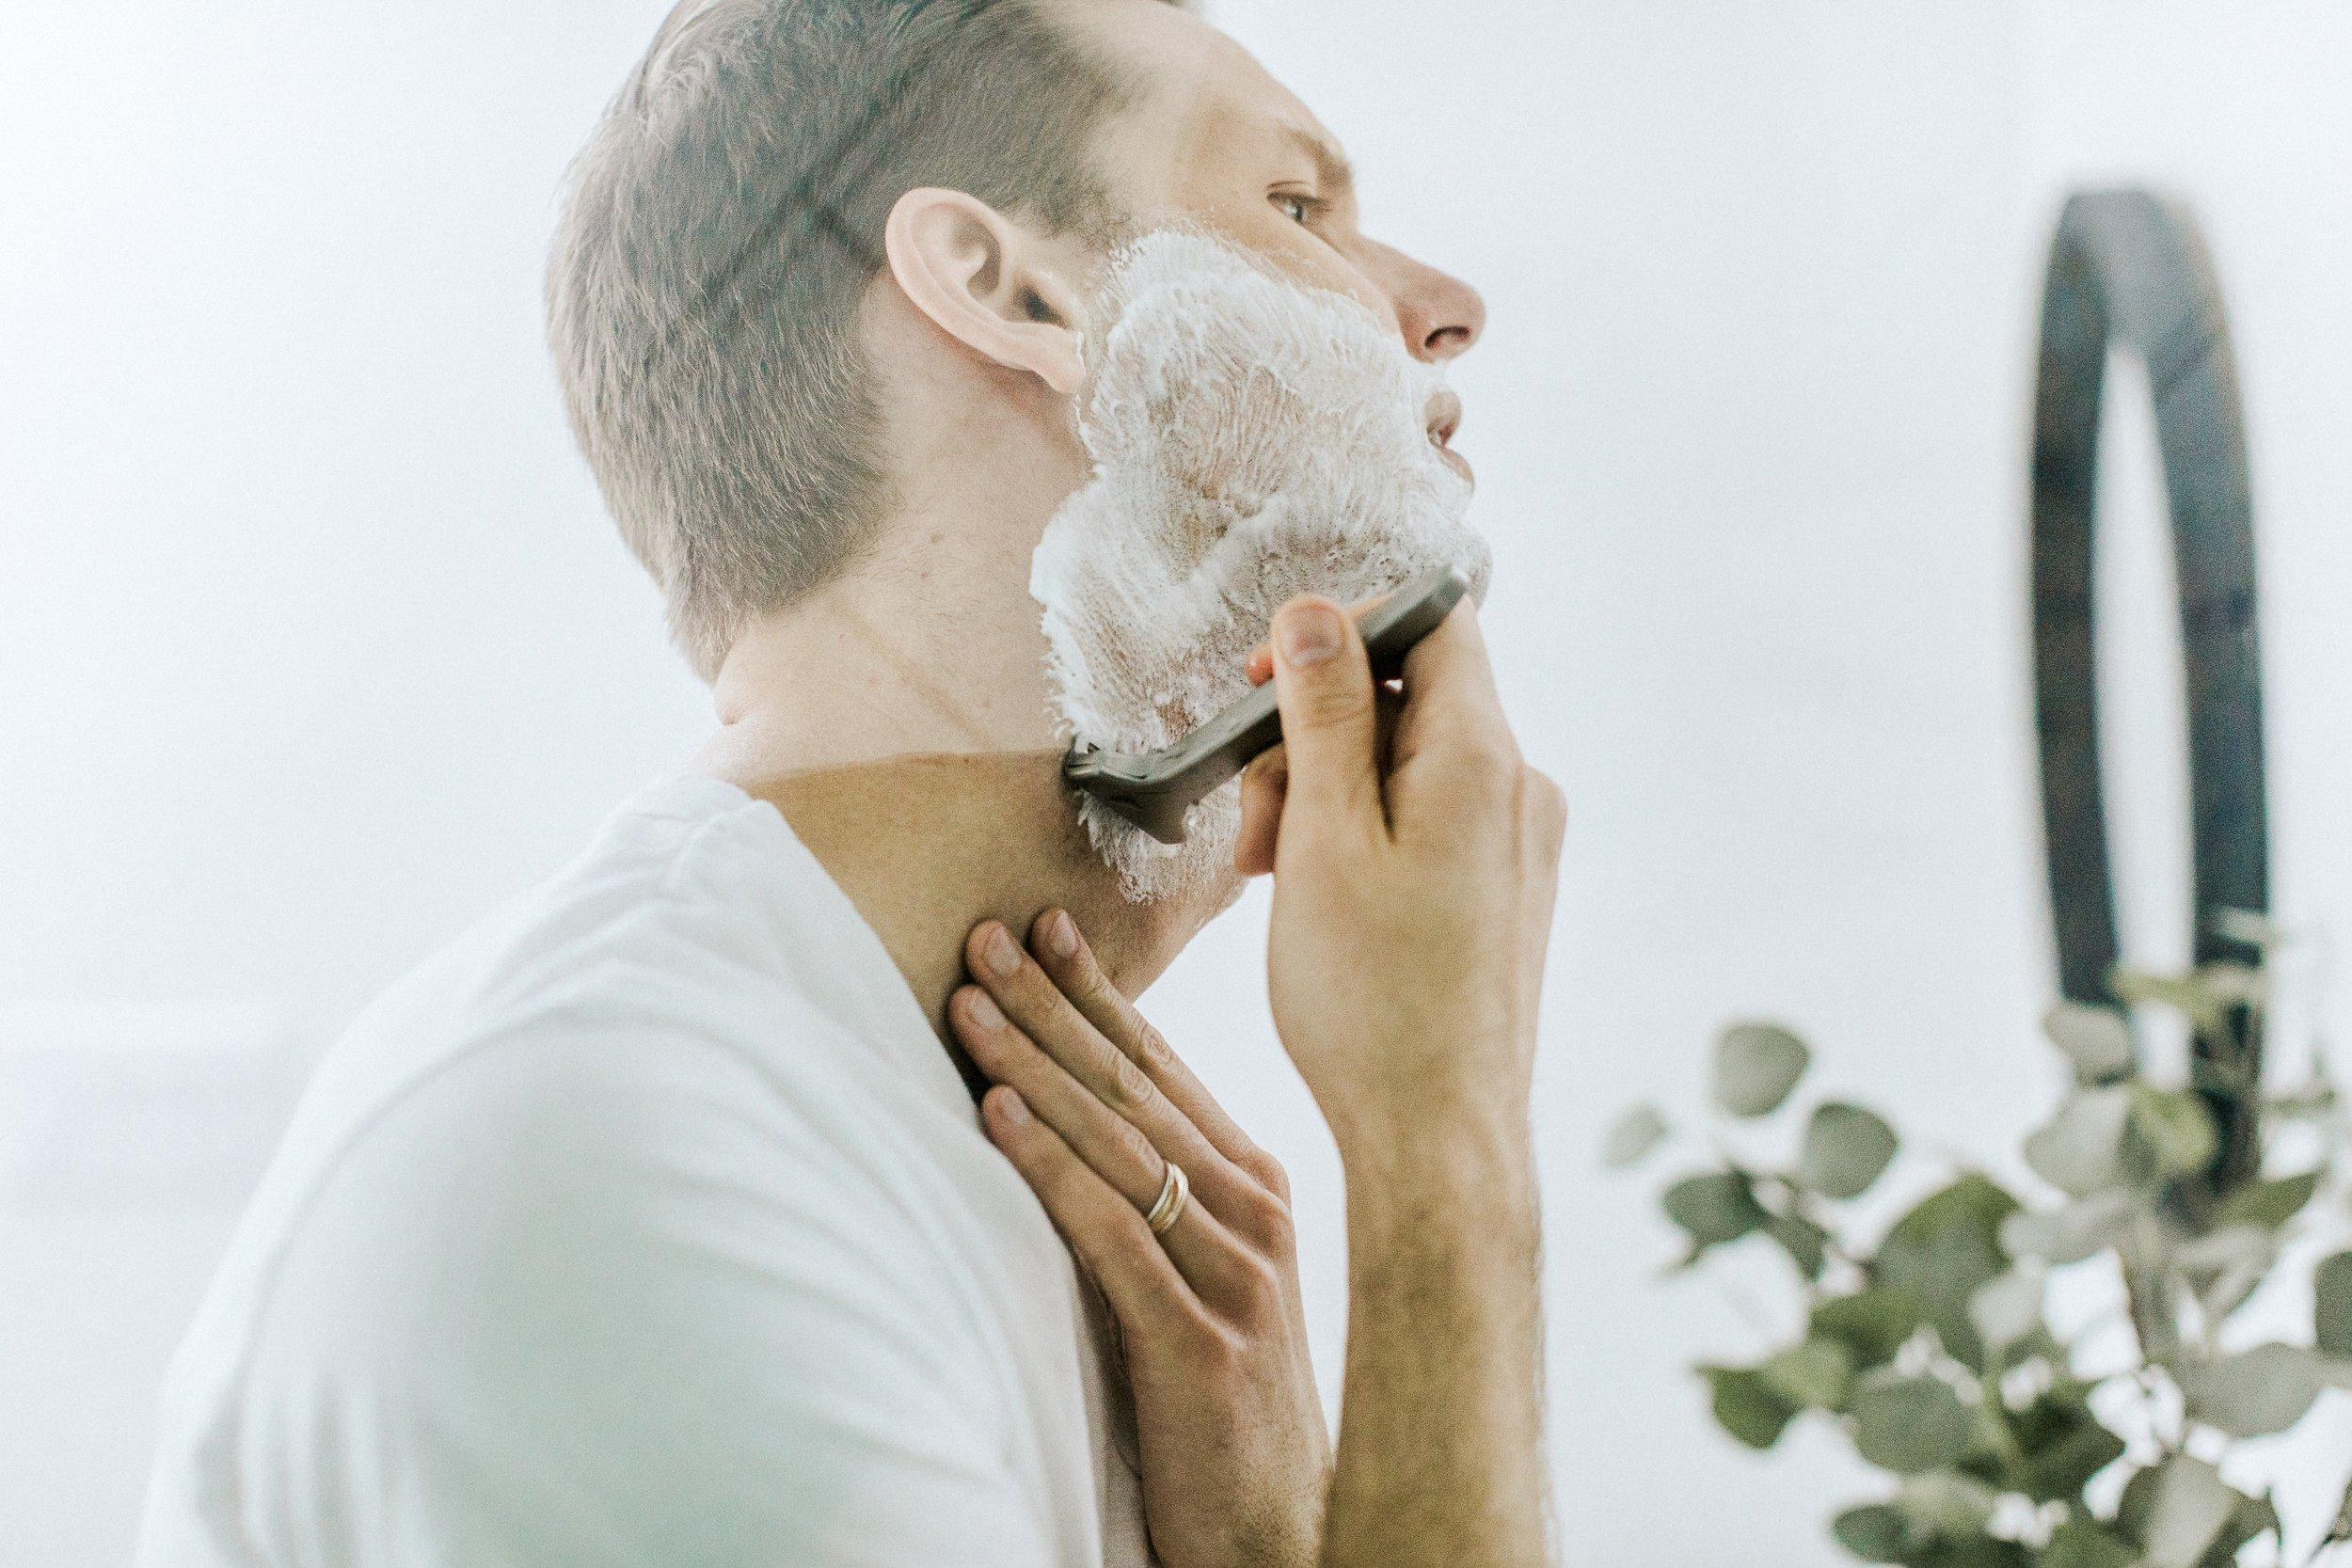 Man shaving his beard. || Photo credit to  Patrick Coddou  on  Unsplash